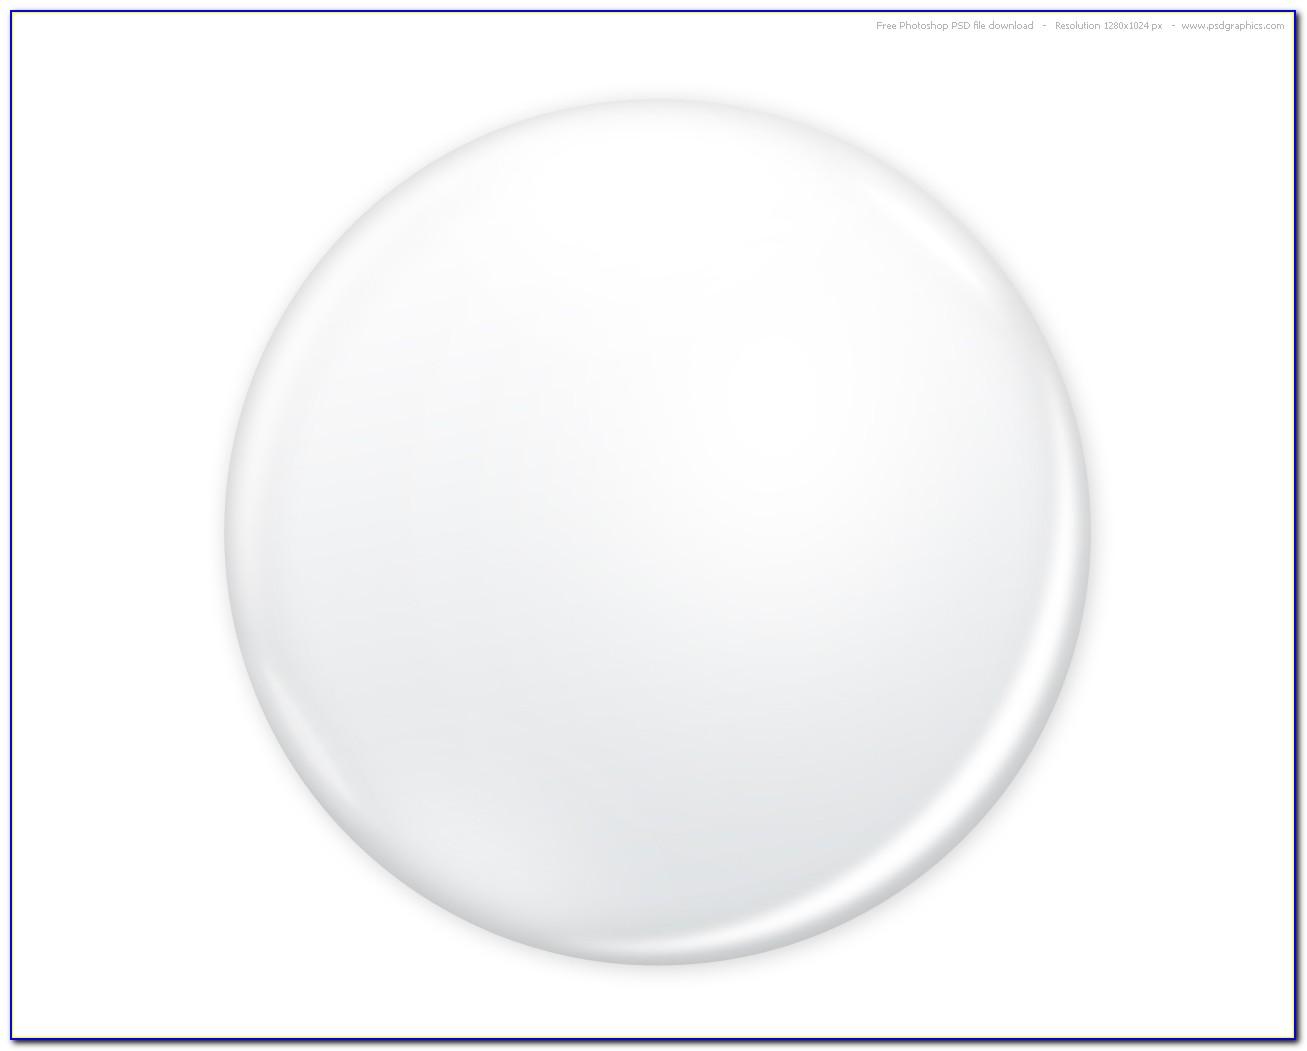 Free Blank Id Badge Template